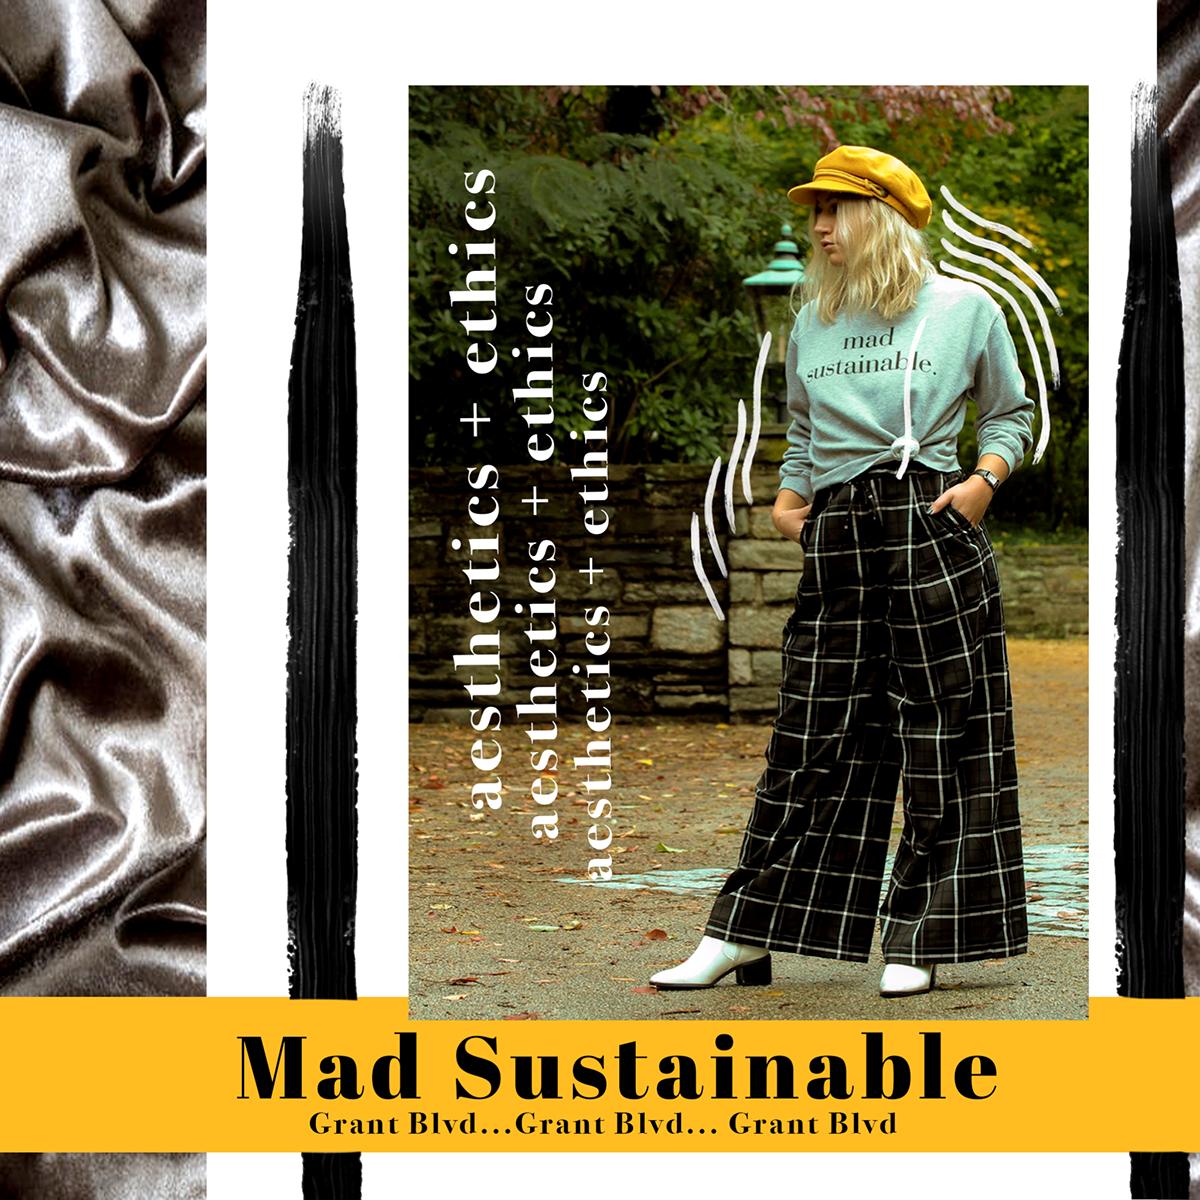 Fashion  Grant Blvd Lookbook Sustainable